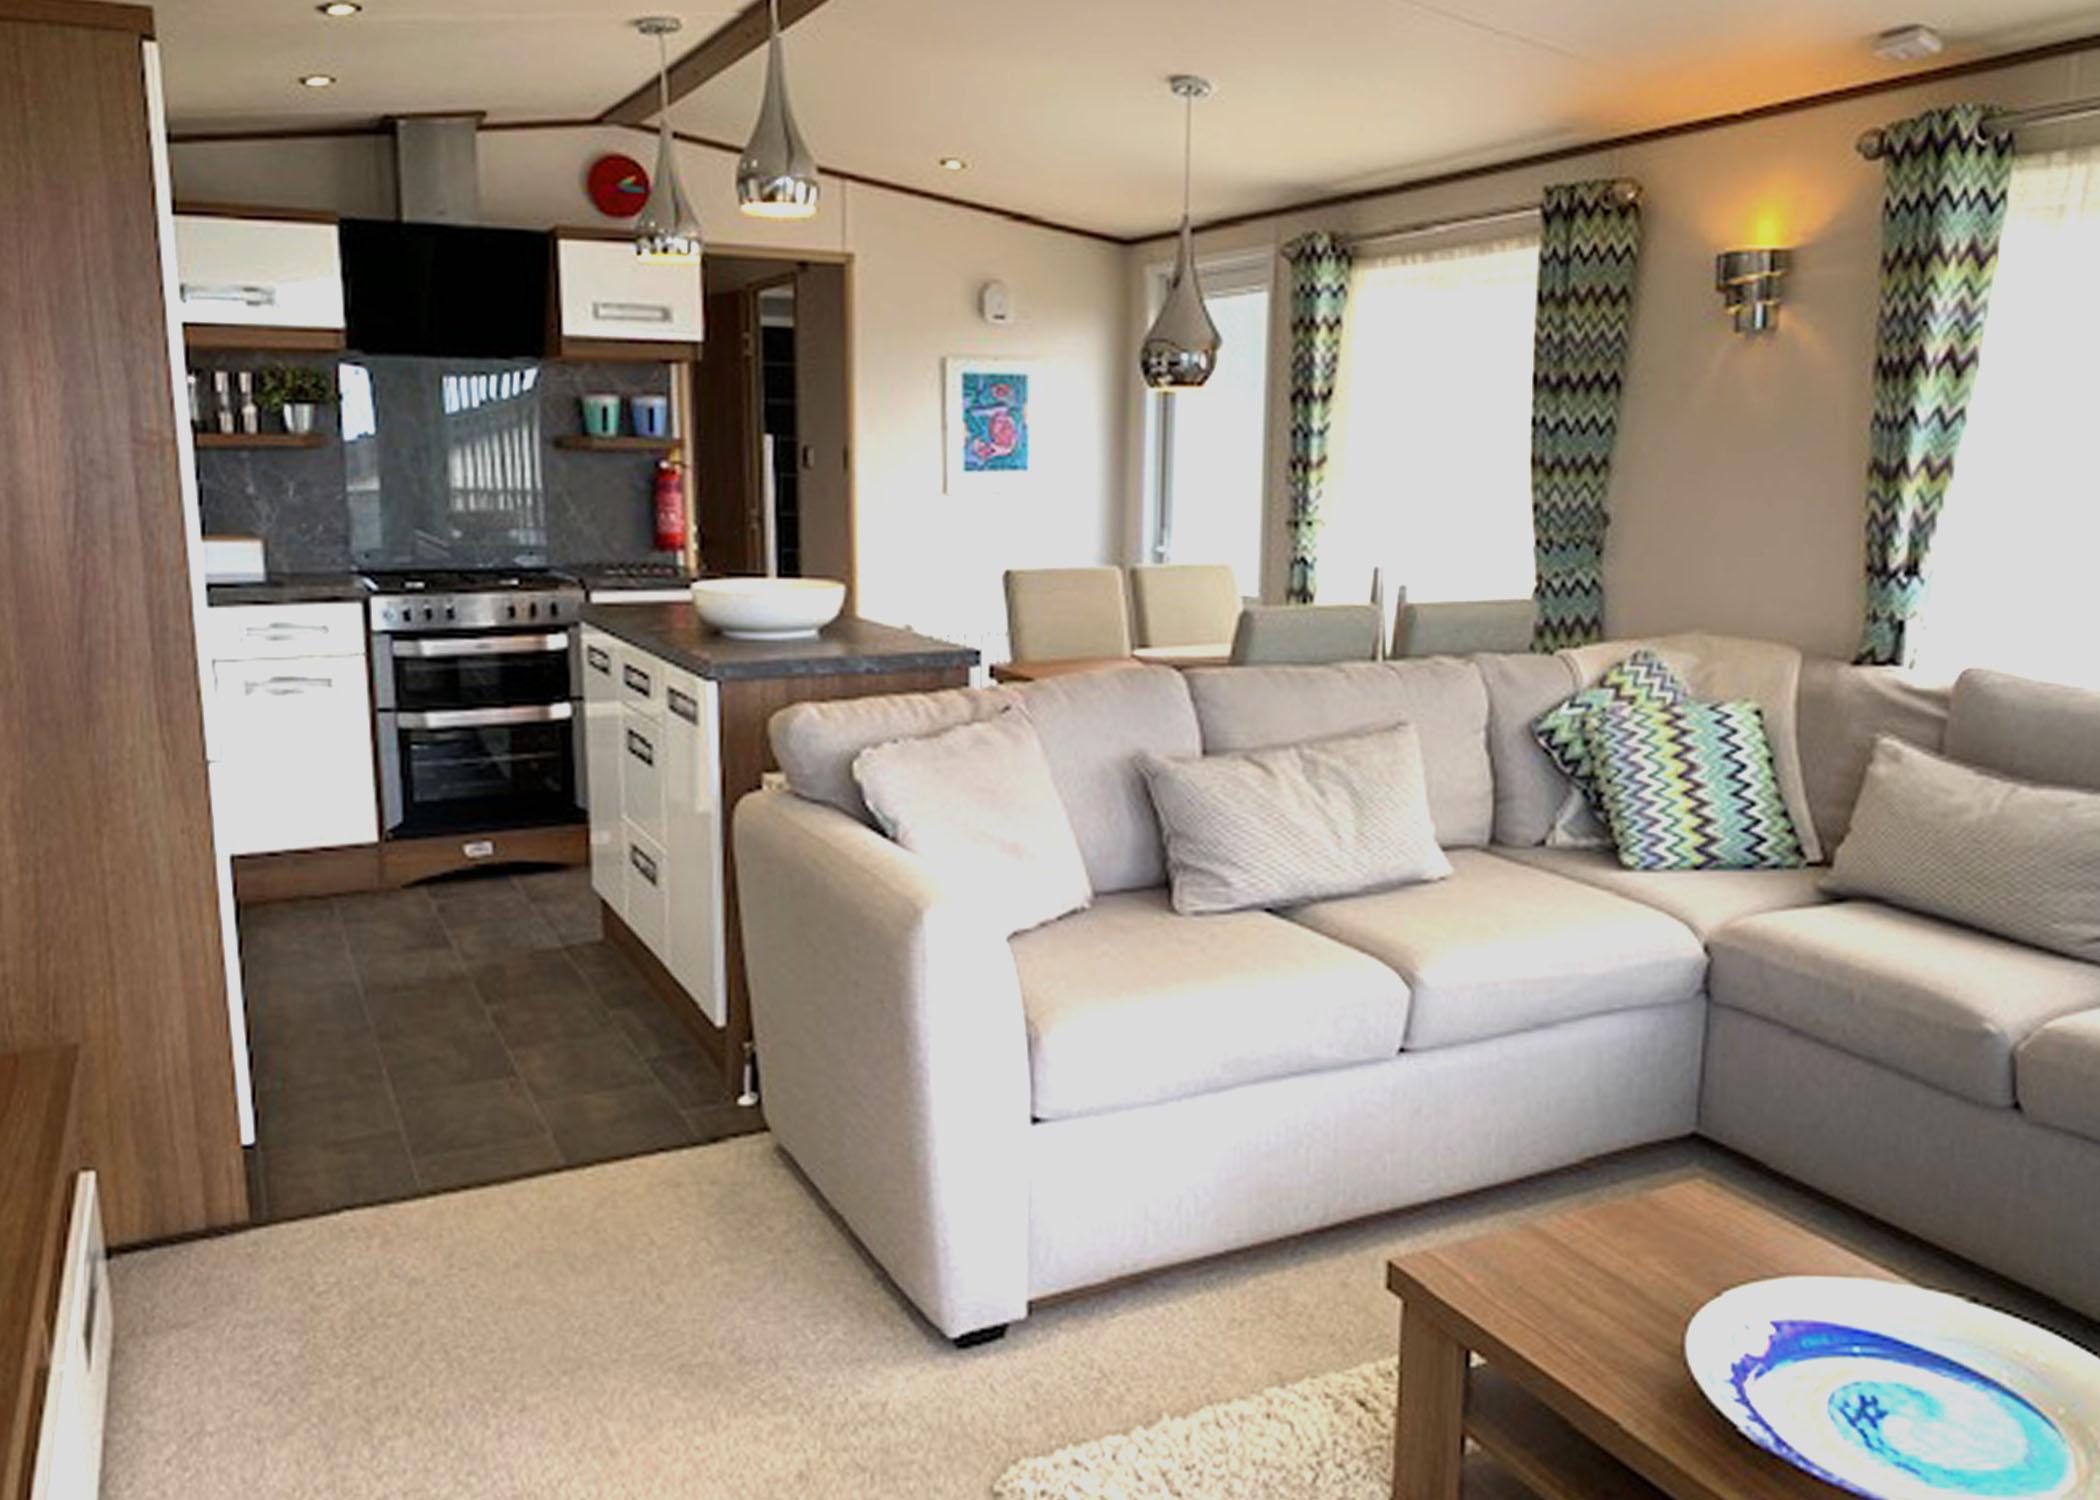 Gwalia Falls, Luxury Lodges, Luxury Holiday Accommodation, Wales